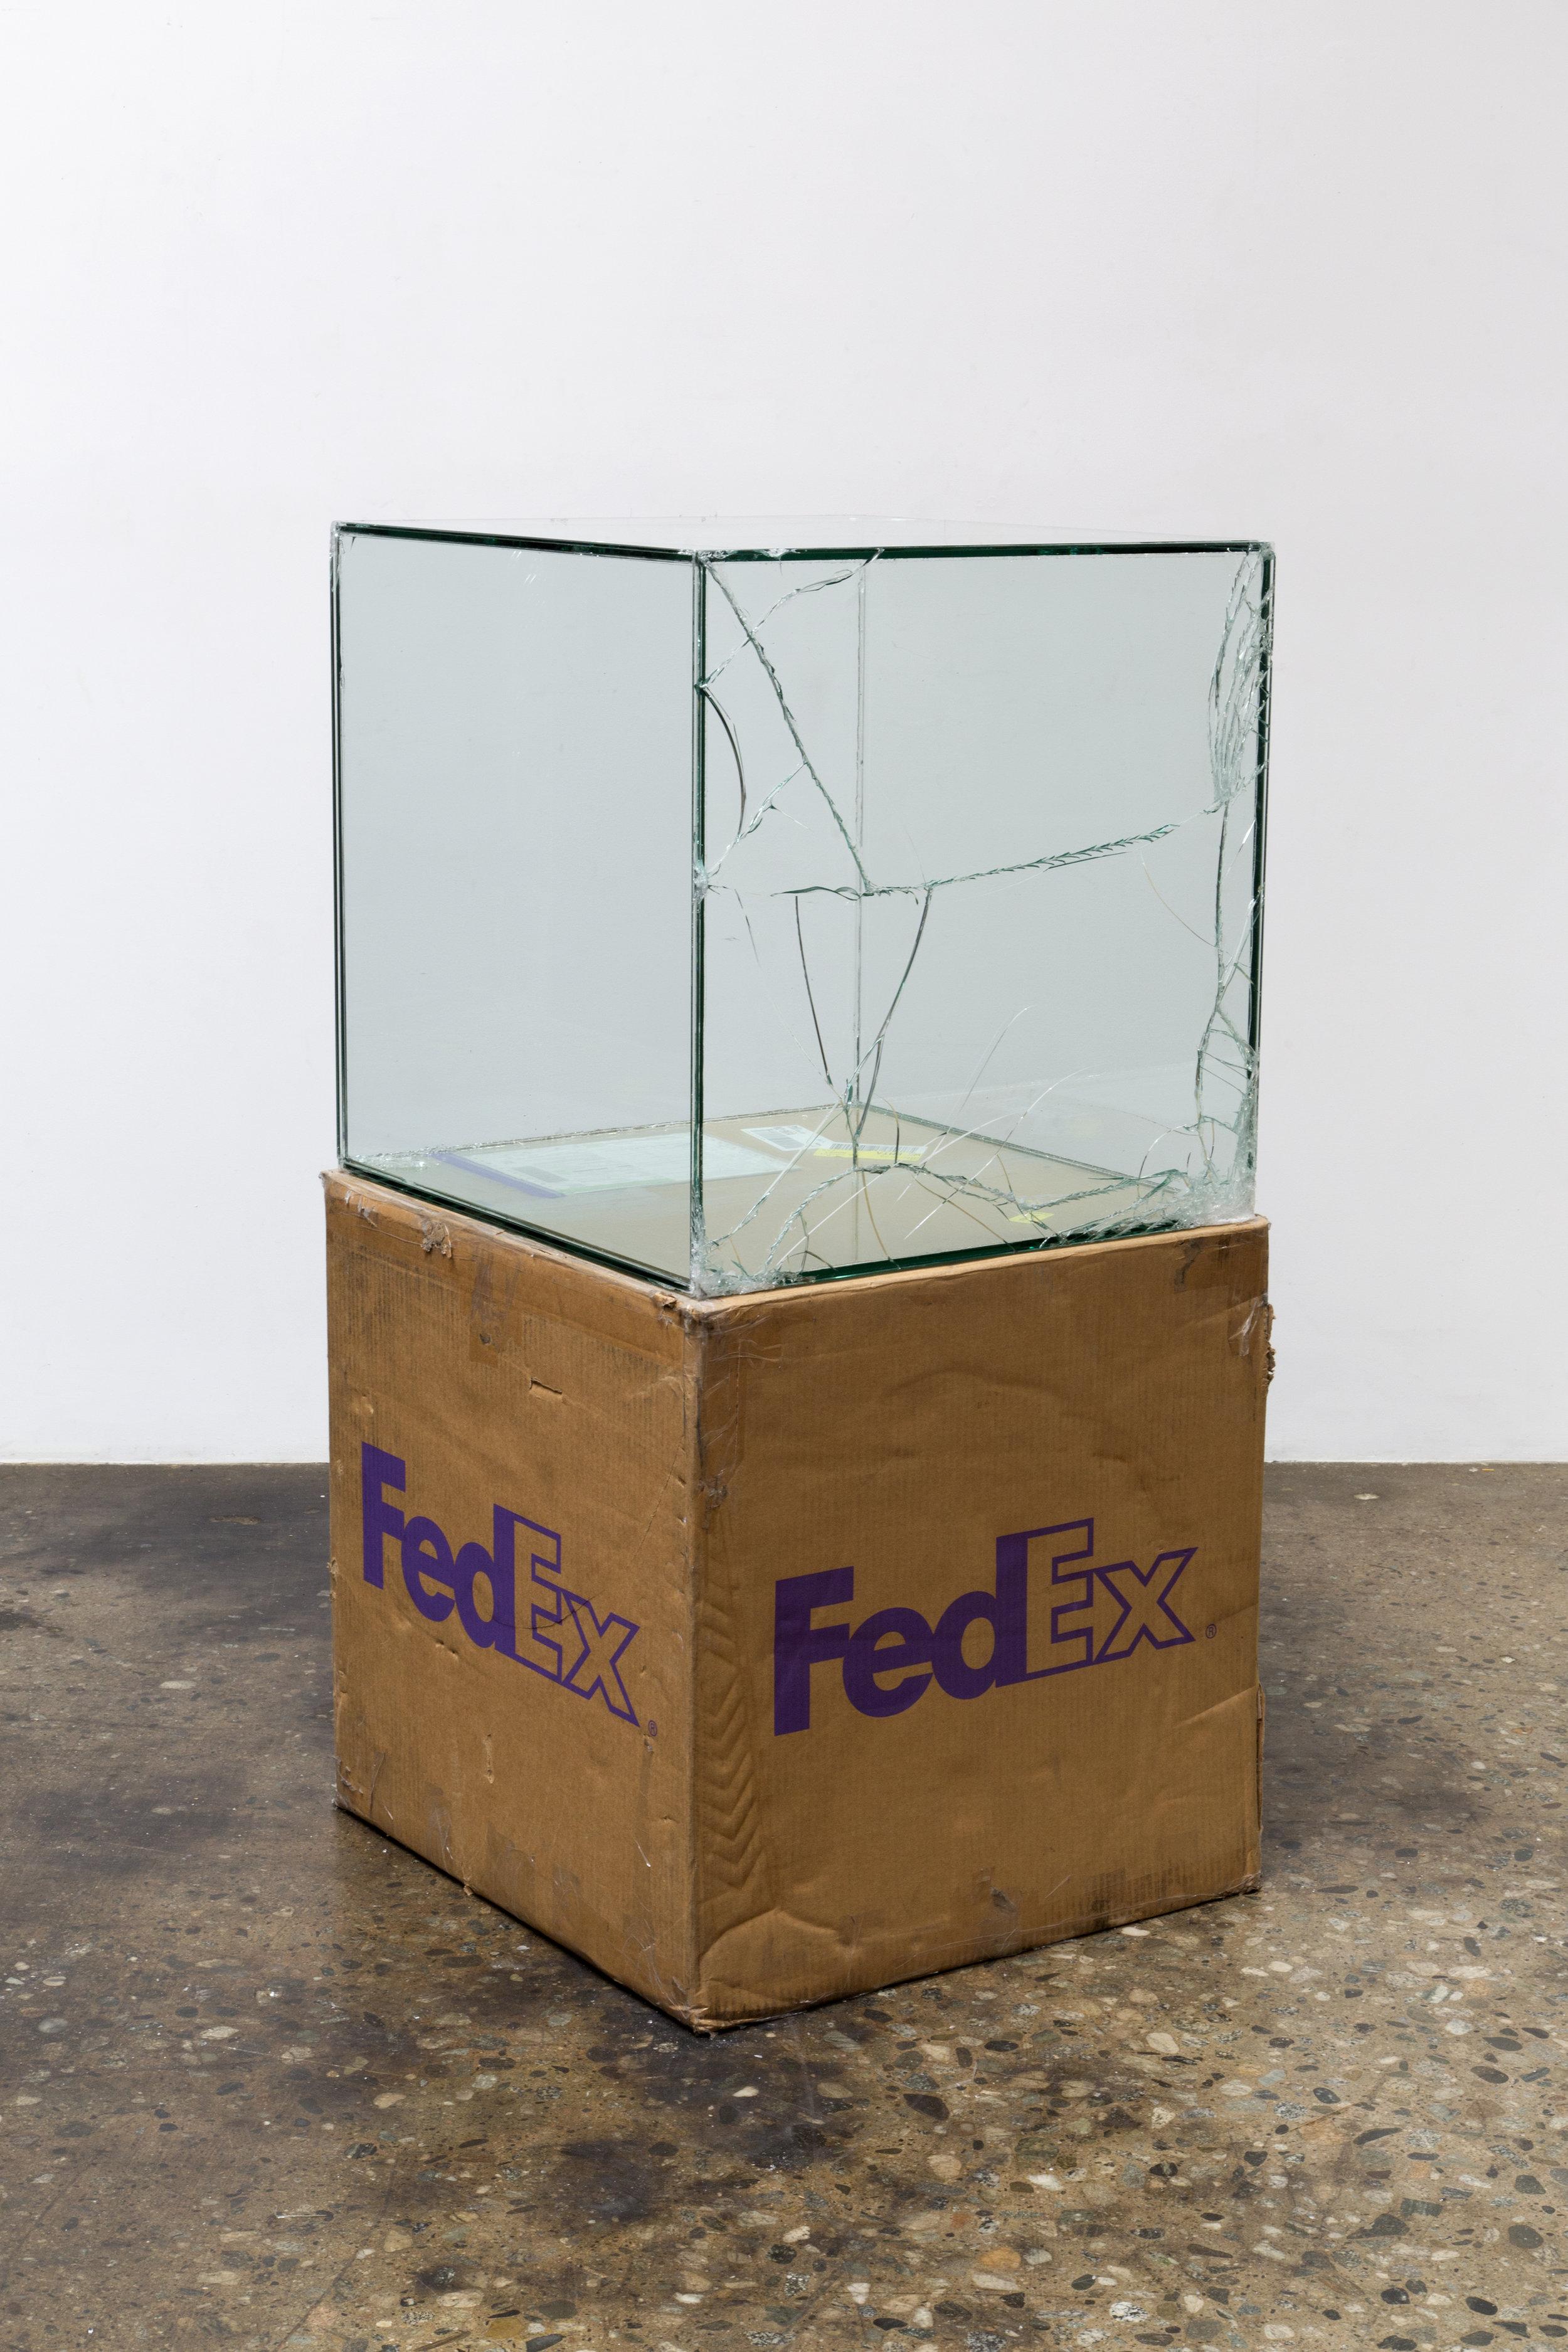 Walead Beshty, FedEx, Large Kraft Box, 2008 FEDEX 330510 REV 6/08 GP, International Priority, Los Angeles–Tokyo trk#778608484821, March 9–13, 2017, International Priority, Tokyo–Los Angeles trk#805795452126, July 13–14, 2017